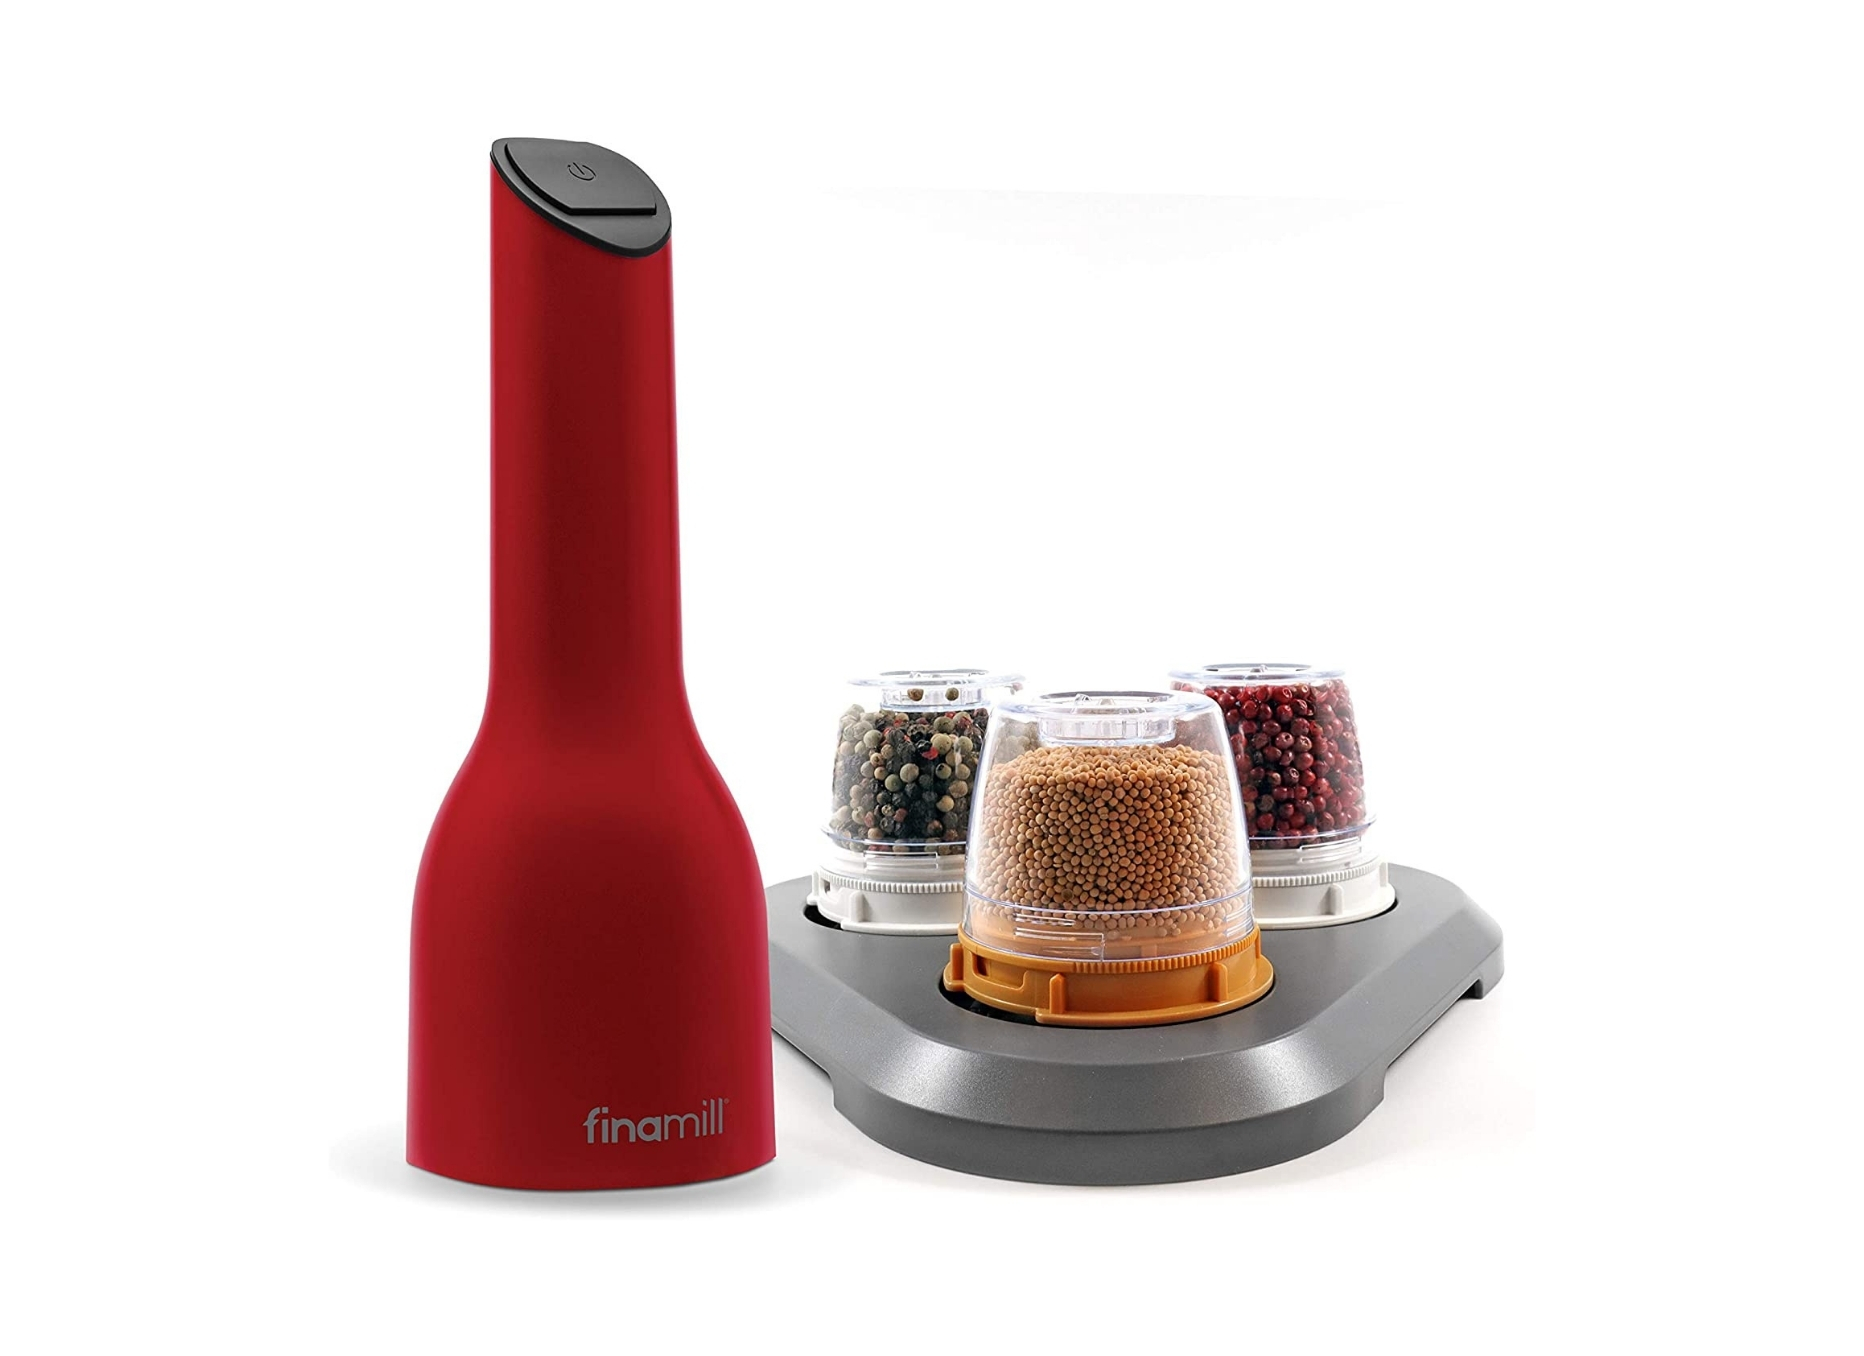 Finamill Spice Grinder